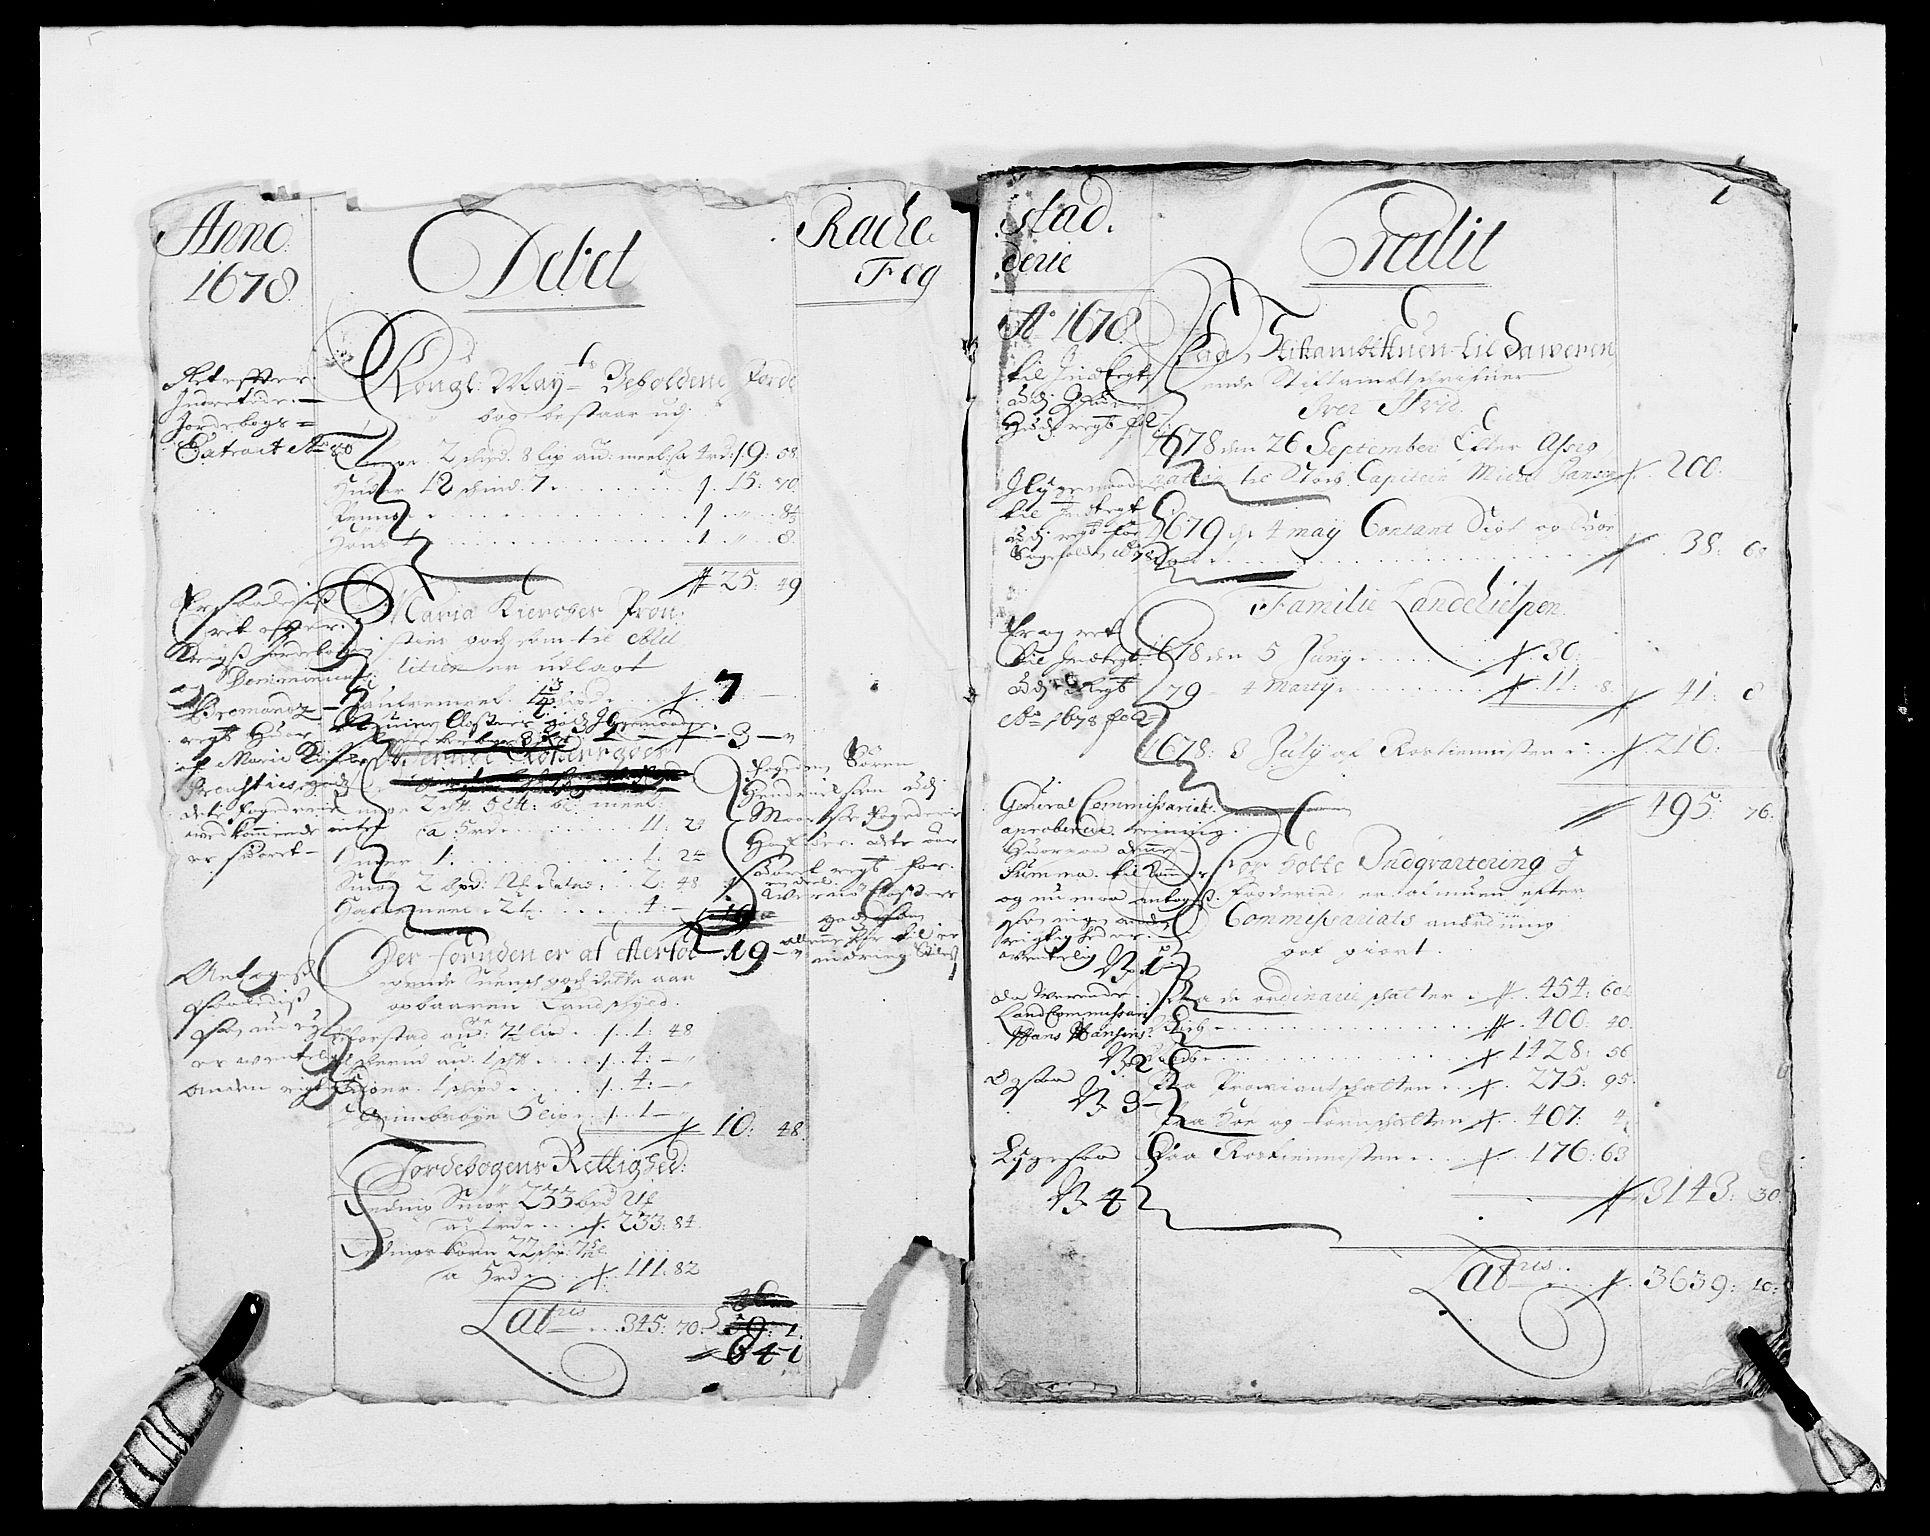 RA, Rentekammeret inntil 1814, Reviderte regnskaper, Fogderegnskap, R05/L0273: Fogderegnskap Rakkestad, 1682, s. 180